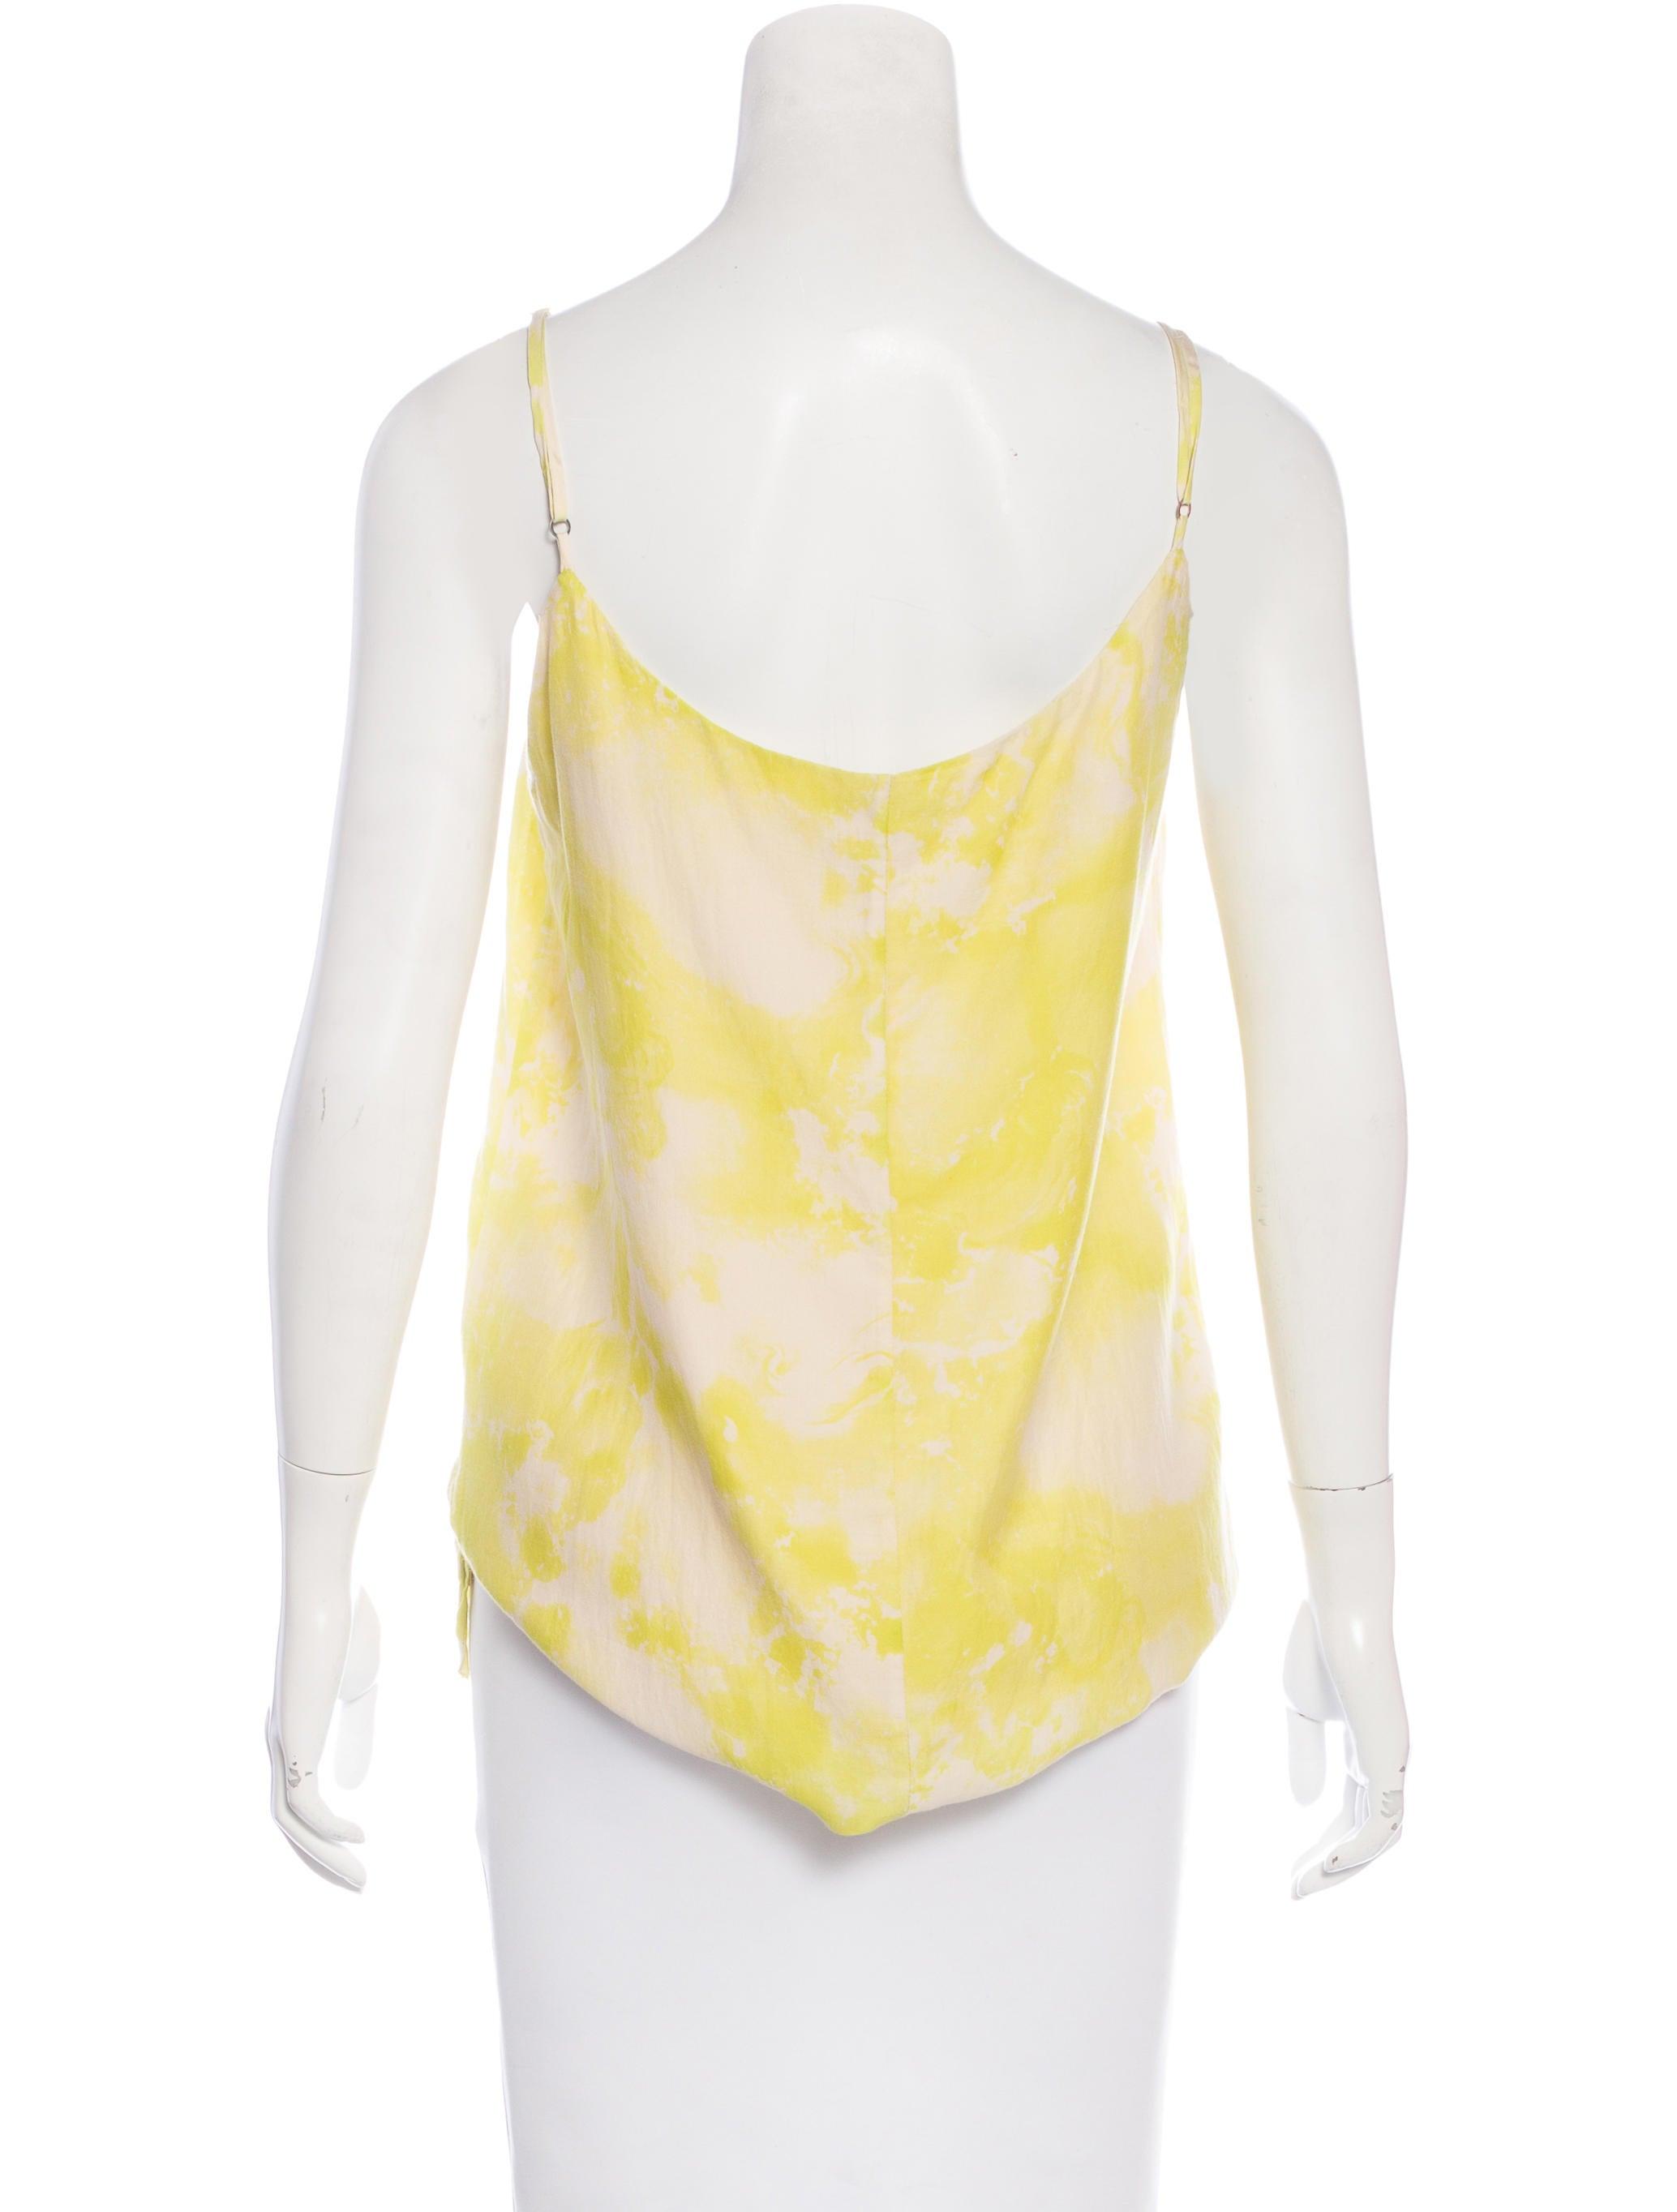 Rag bone tie dye sleeveless camisole clothing for Tie dye sleeveless shirts